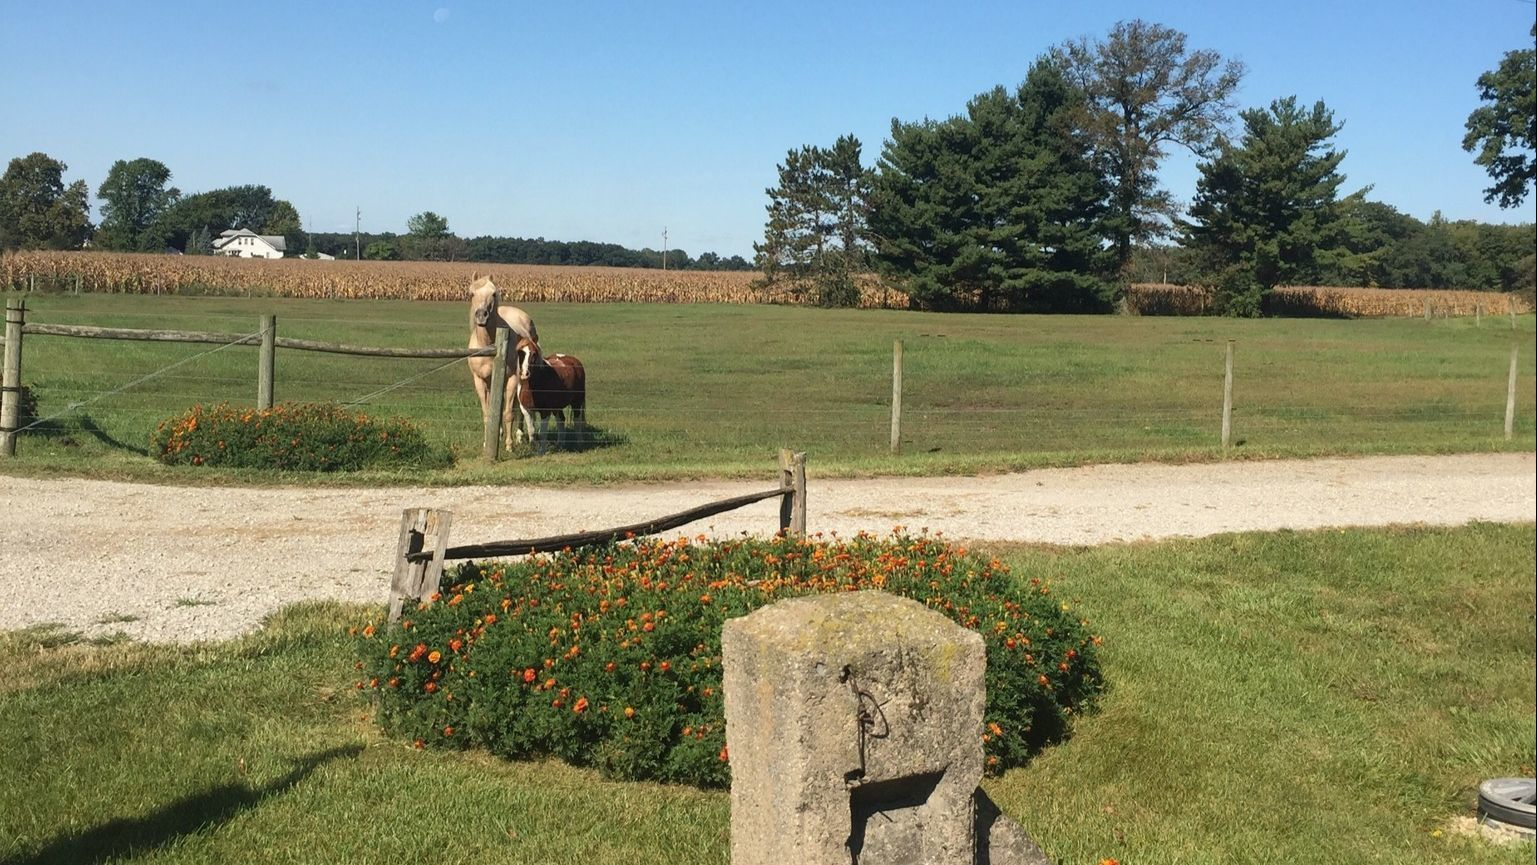 Marigold blossoms have a long family farm history